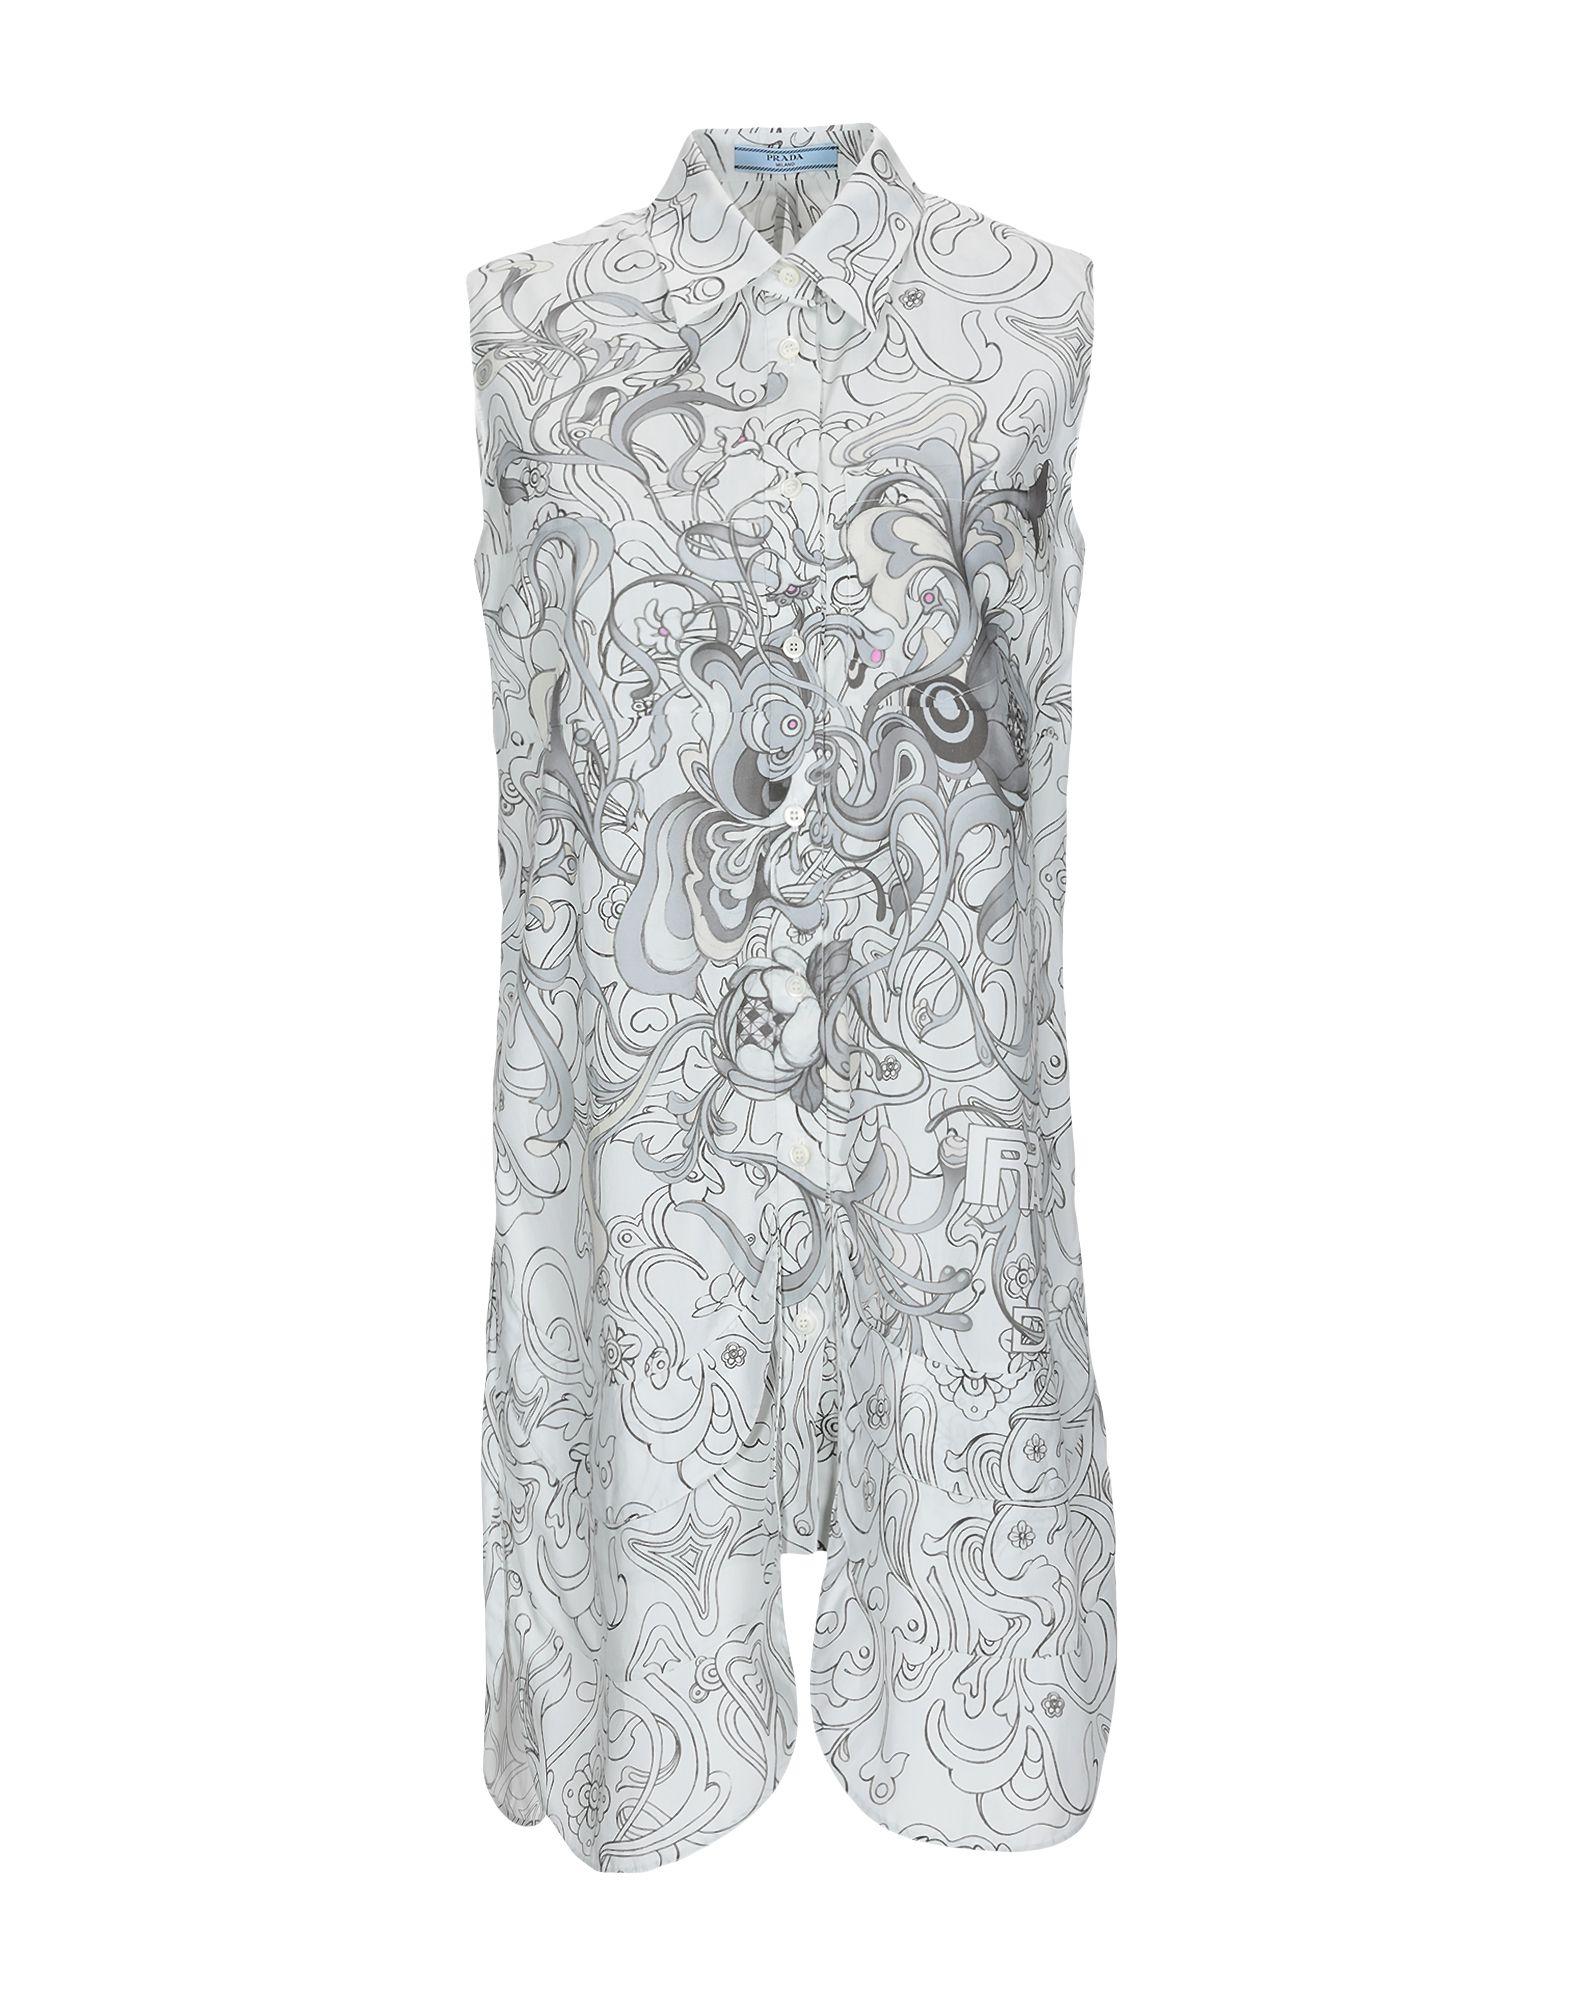 7d18ceeb Prada Shirts - Prada Women - YOOX United States